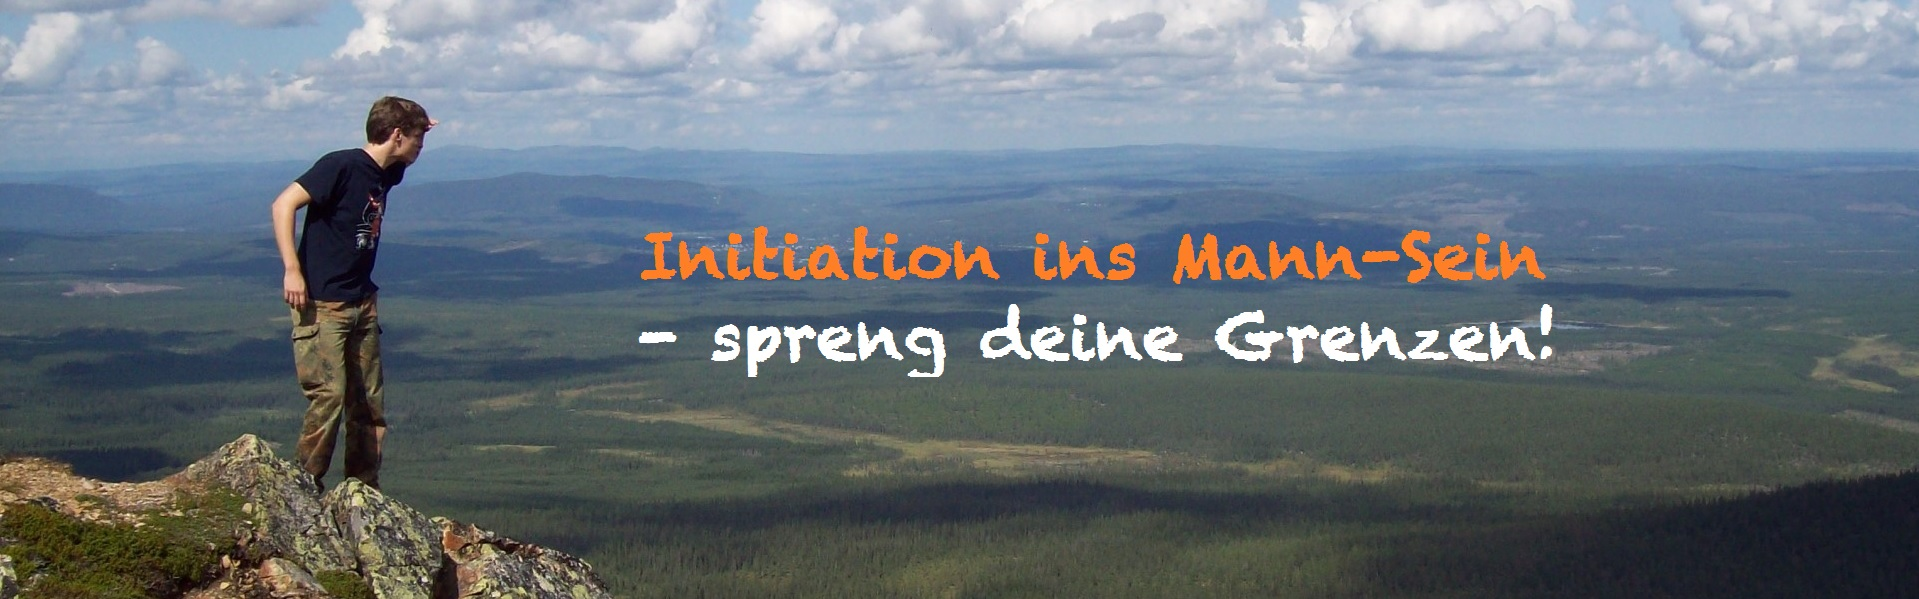 Initiation_junge_Männer.jpg